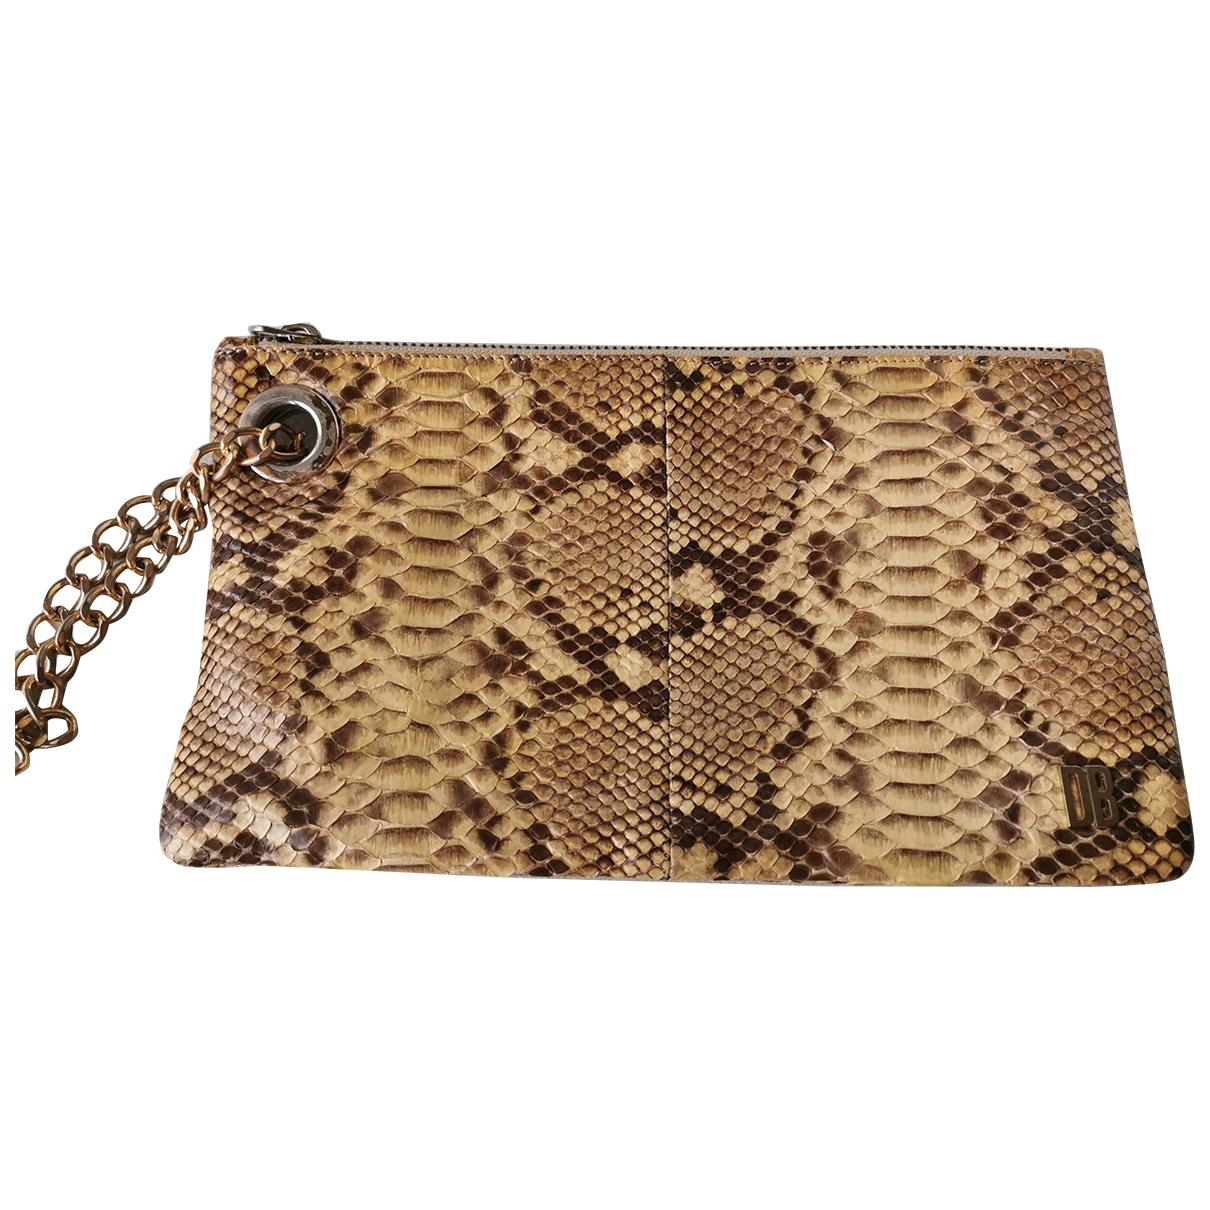 Dirk Bikkembergs - Pochette   pour femme en python - beige